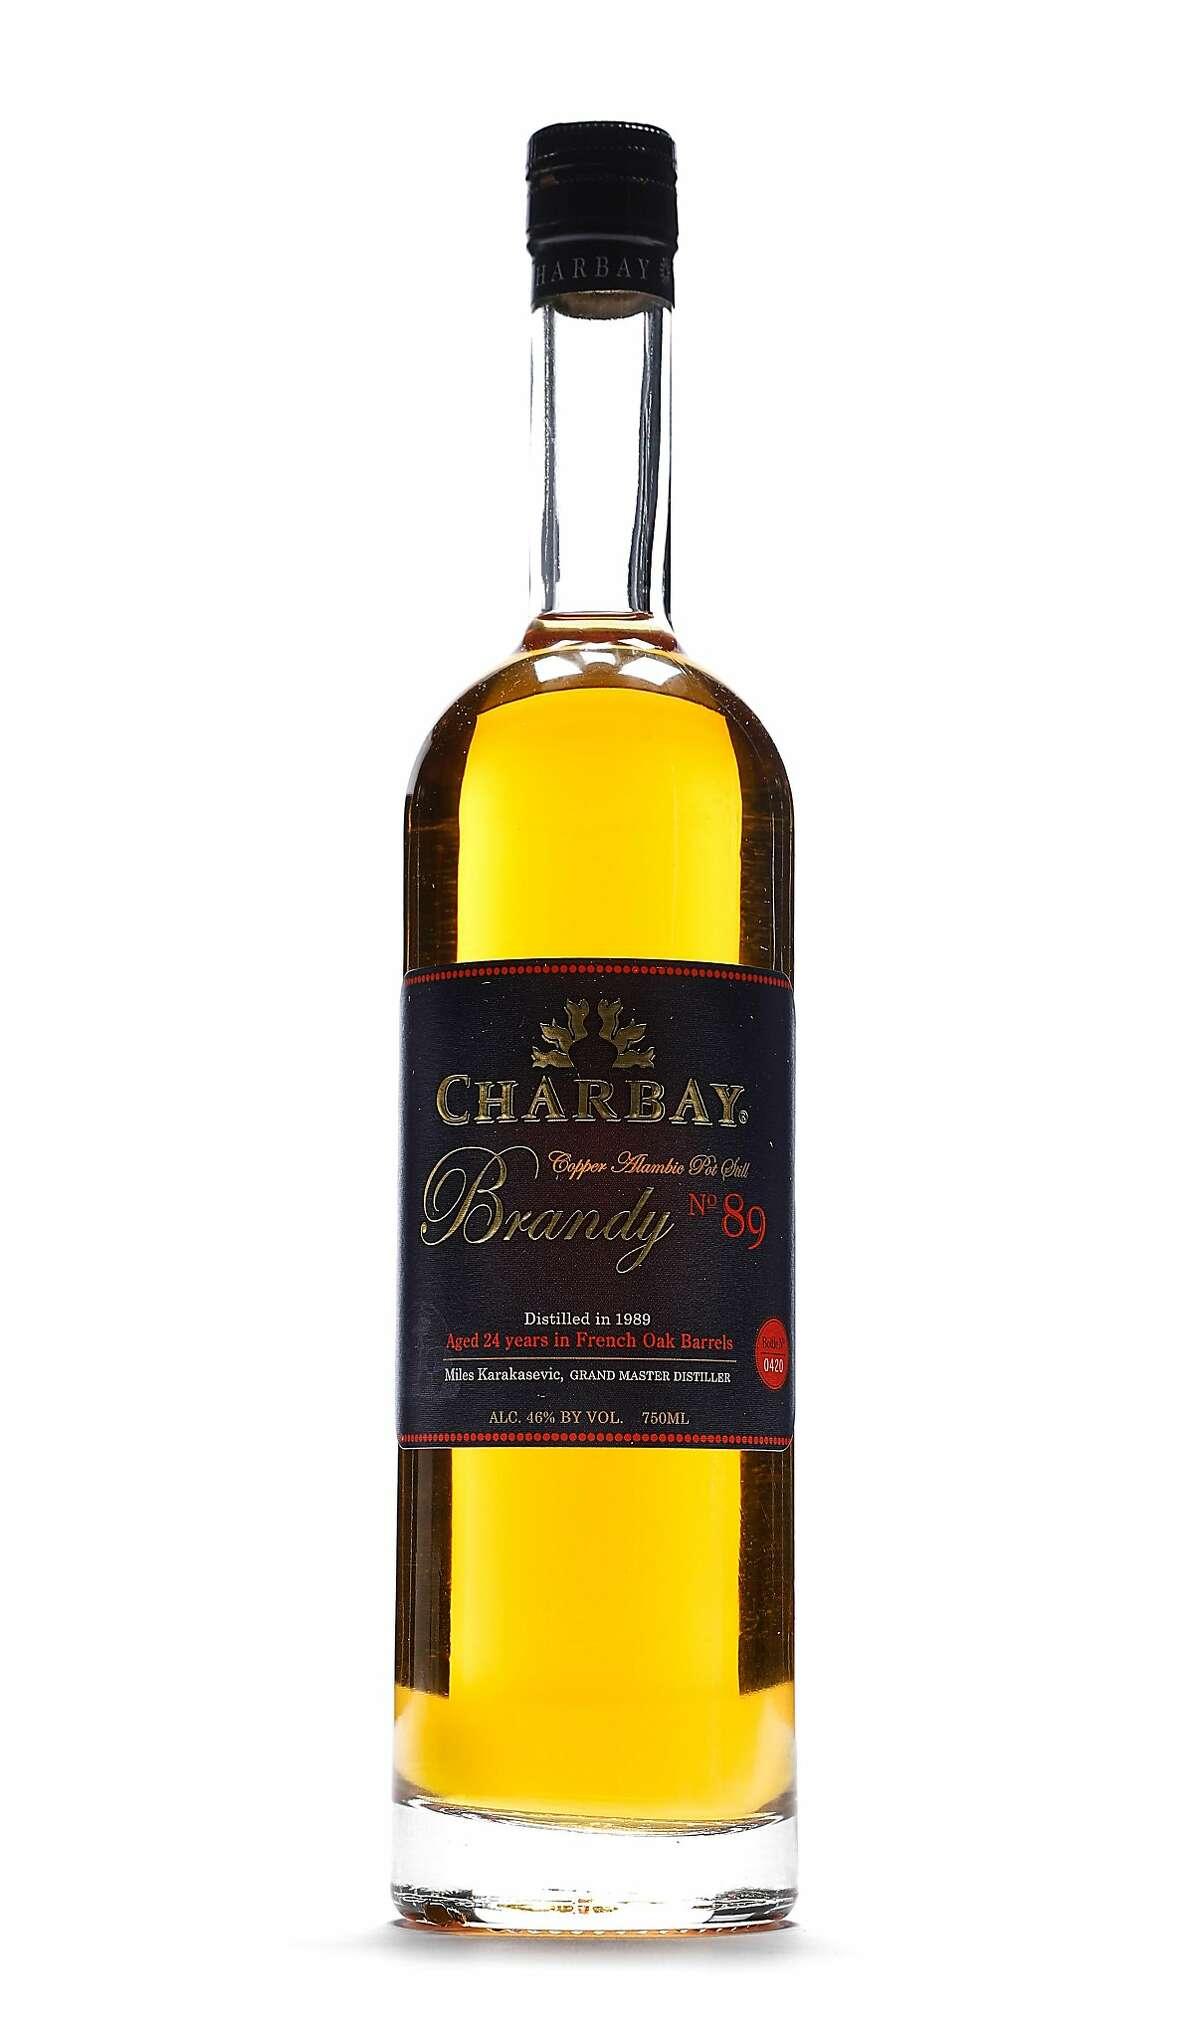 Charbray Brandy No. 89